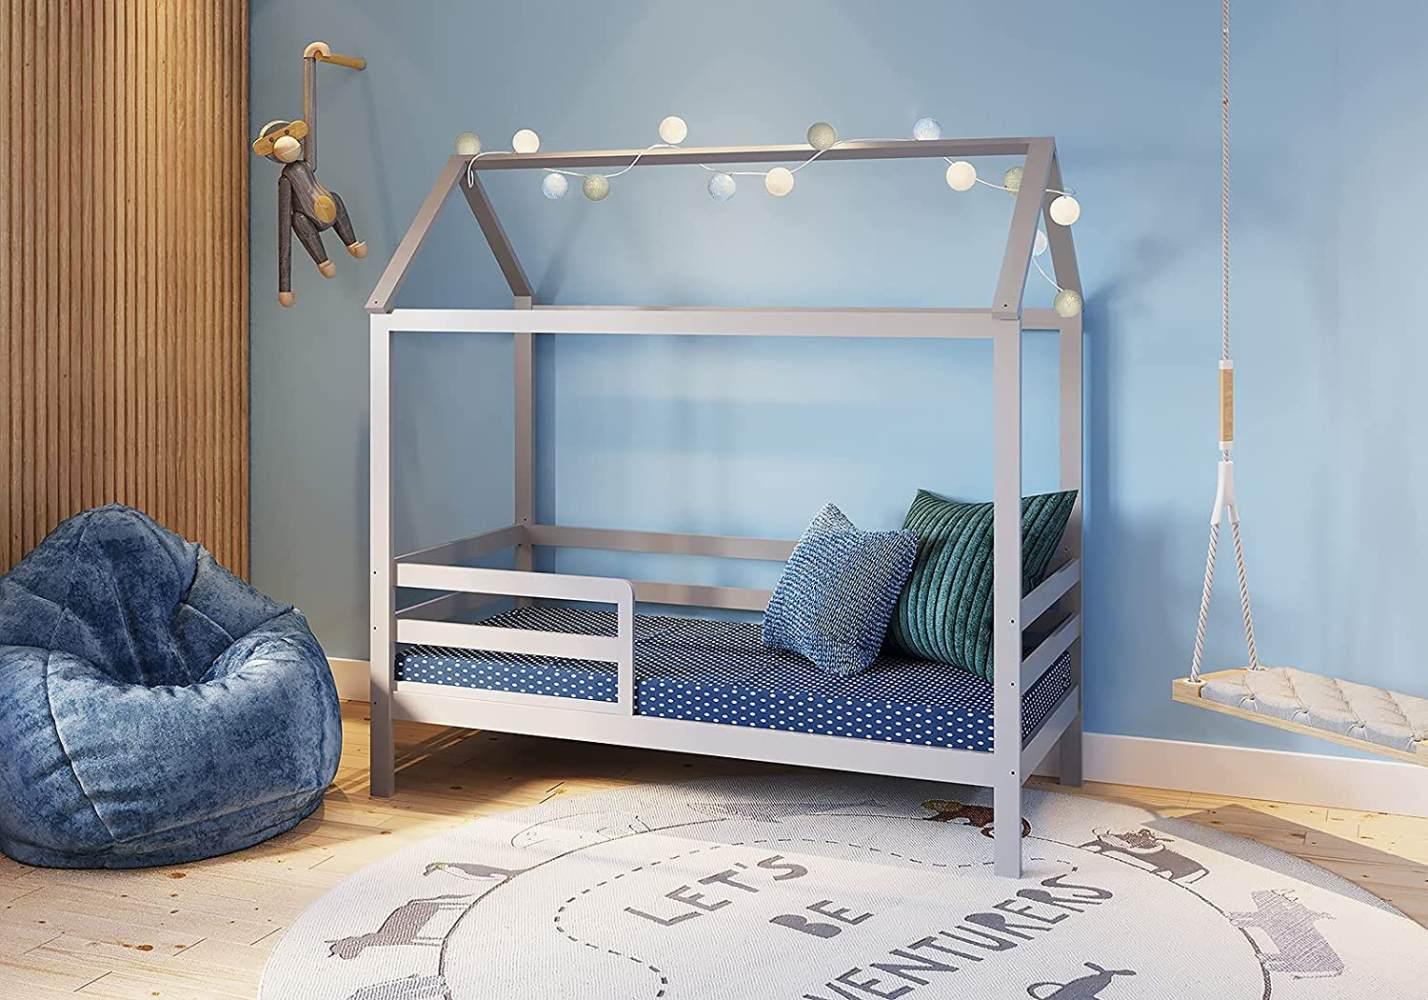 FabiMax 'Schlummerhaus' Kinderbett, 80 x 160 cm, grau, Kiefer massiv, mit Matratze Comfort Bild 1